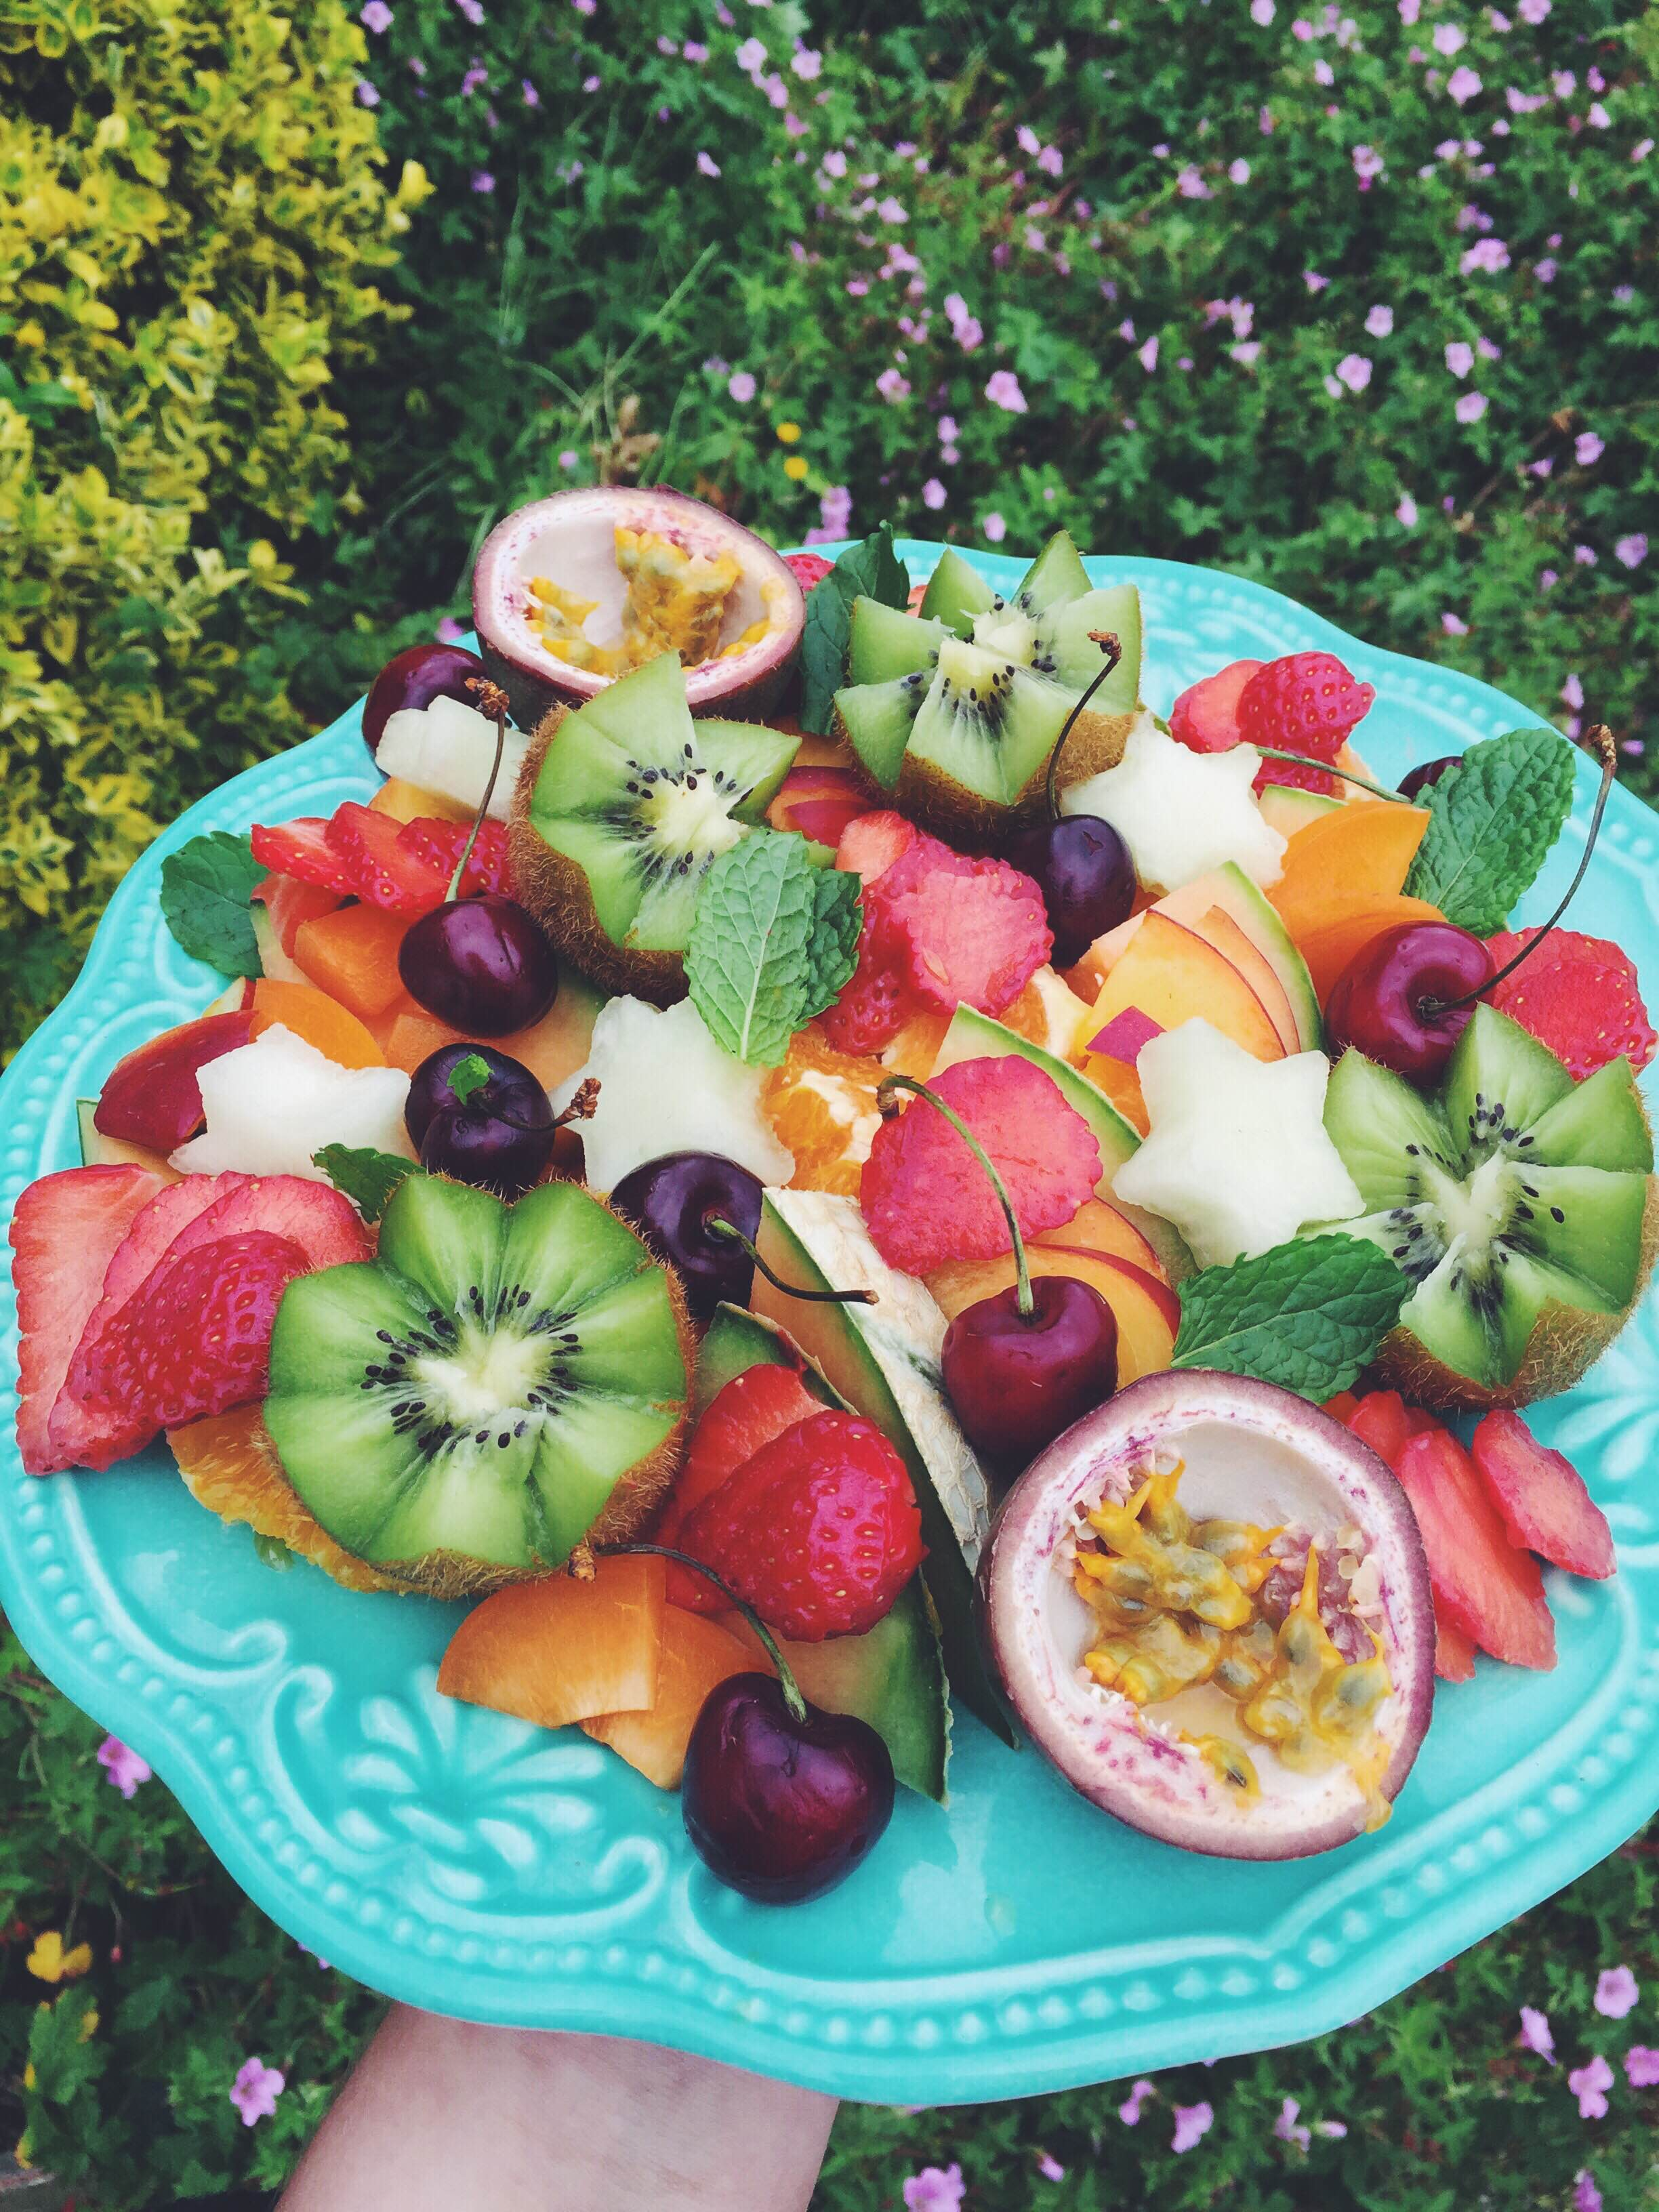 Fruit platters for breakfast < 3